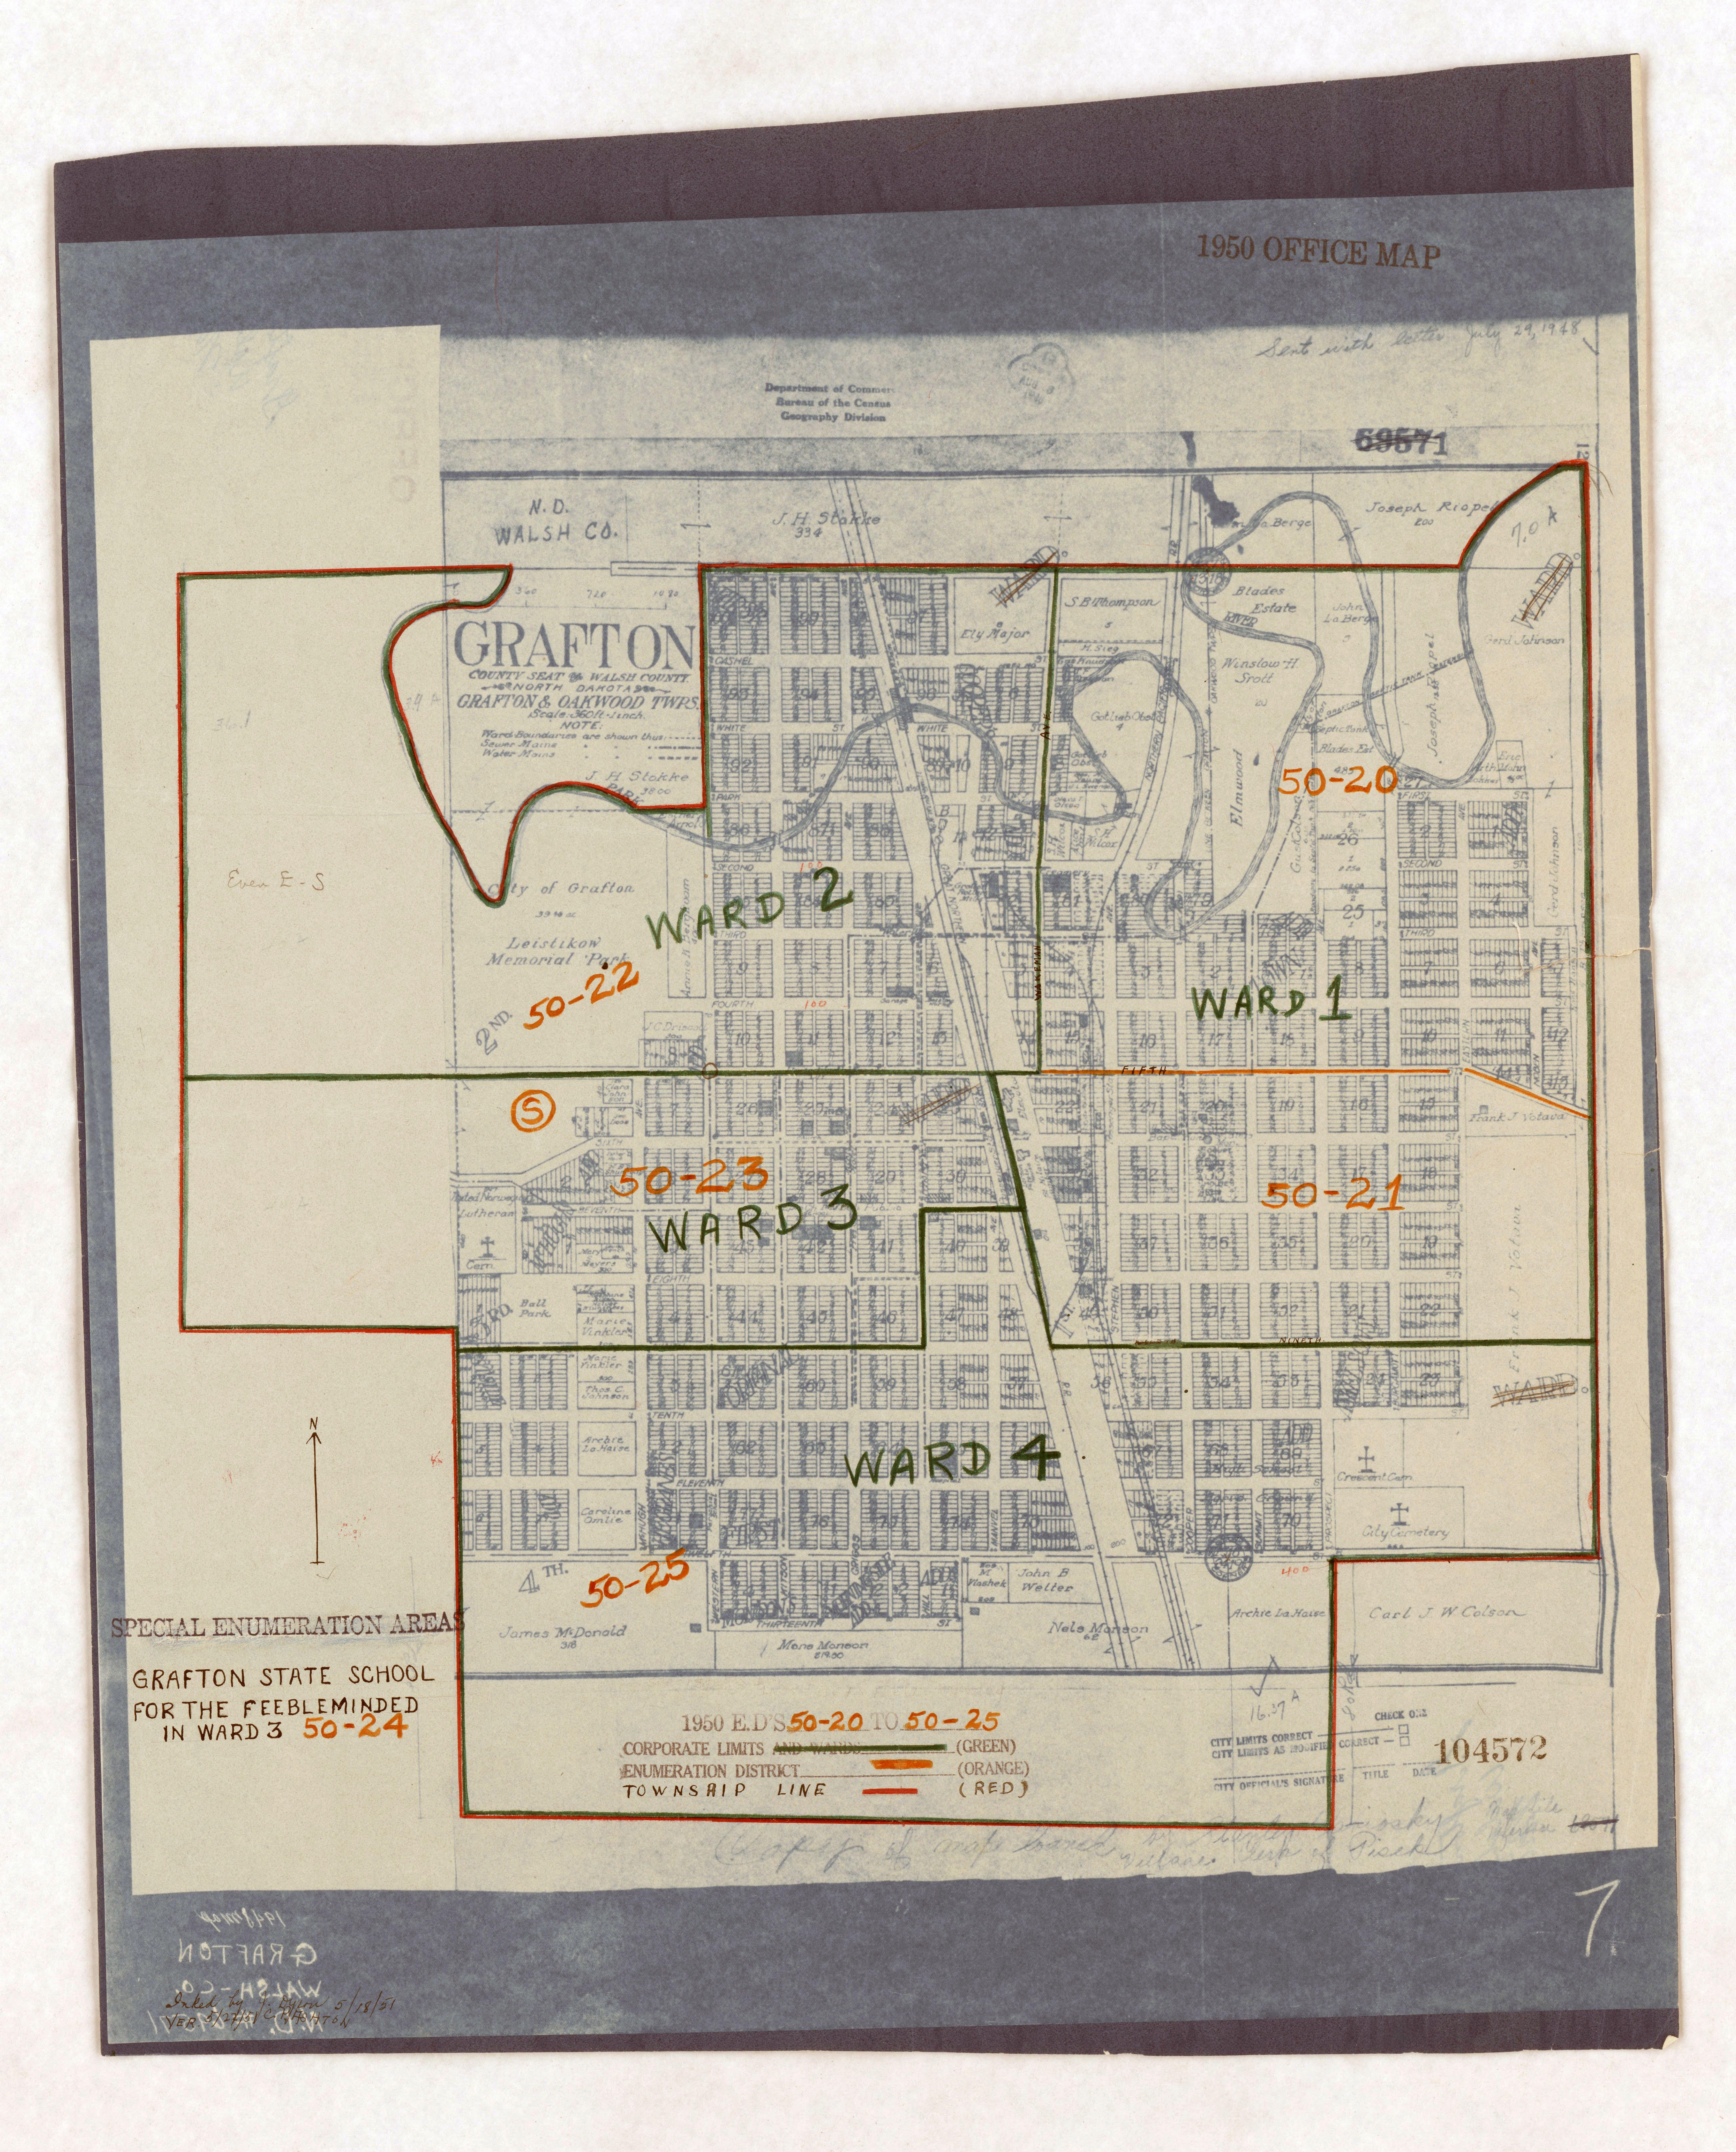 1950 Census Enumeration District Maps - North Dakota (ND) - Walsh County - Grafton - ED 50-20 to 25